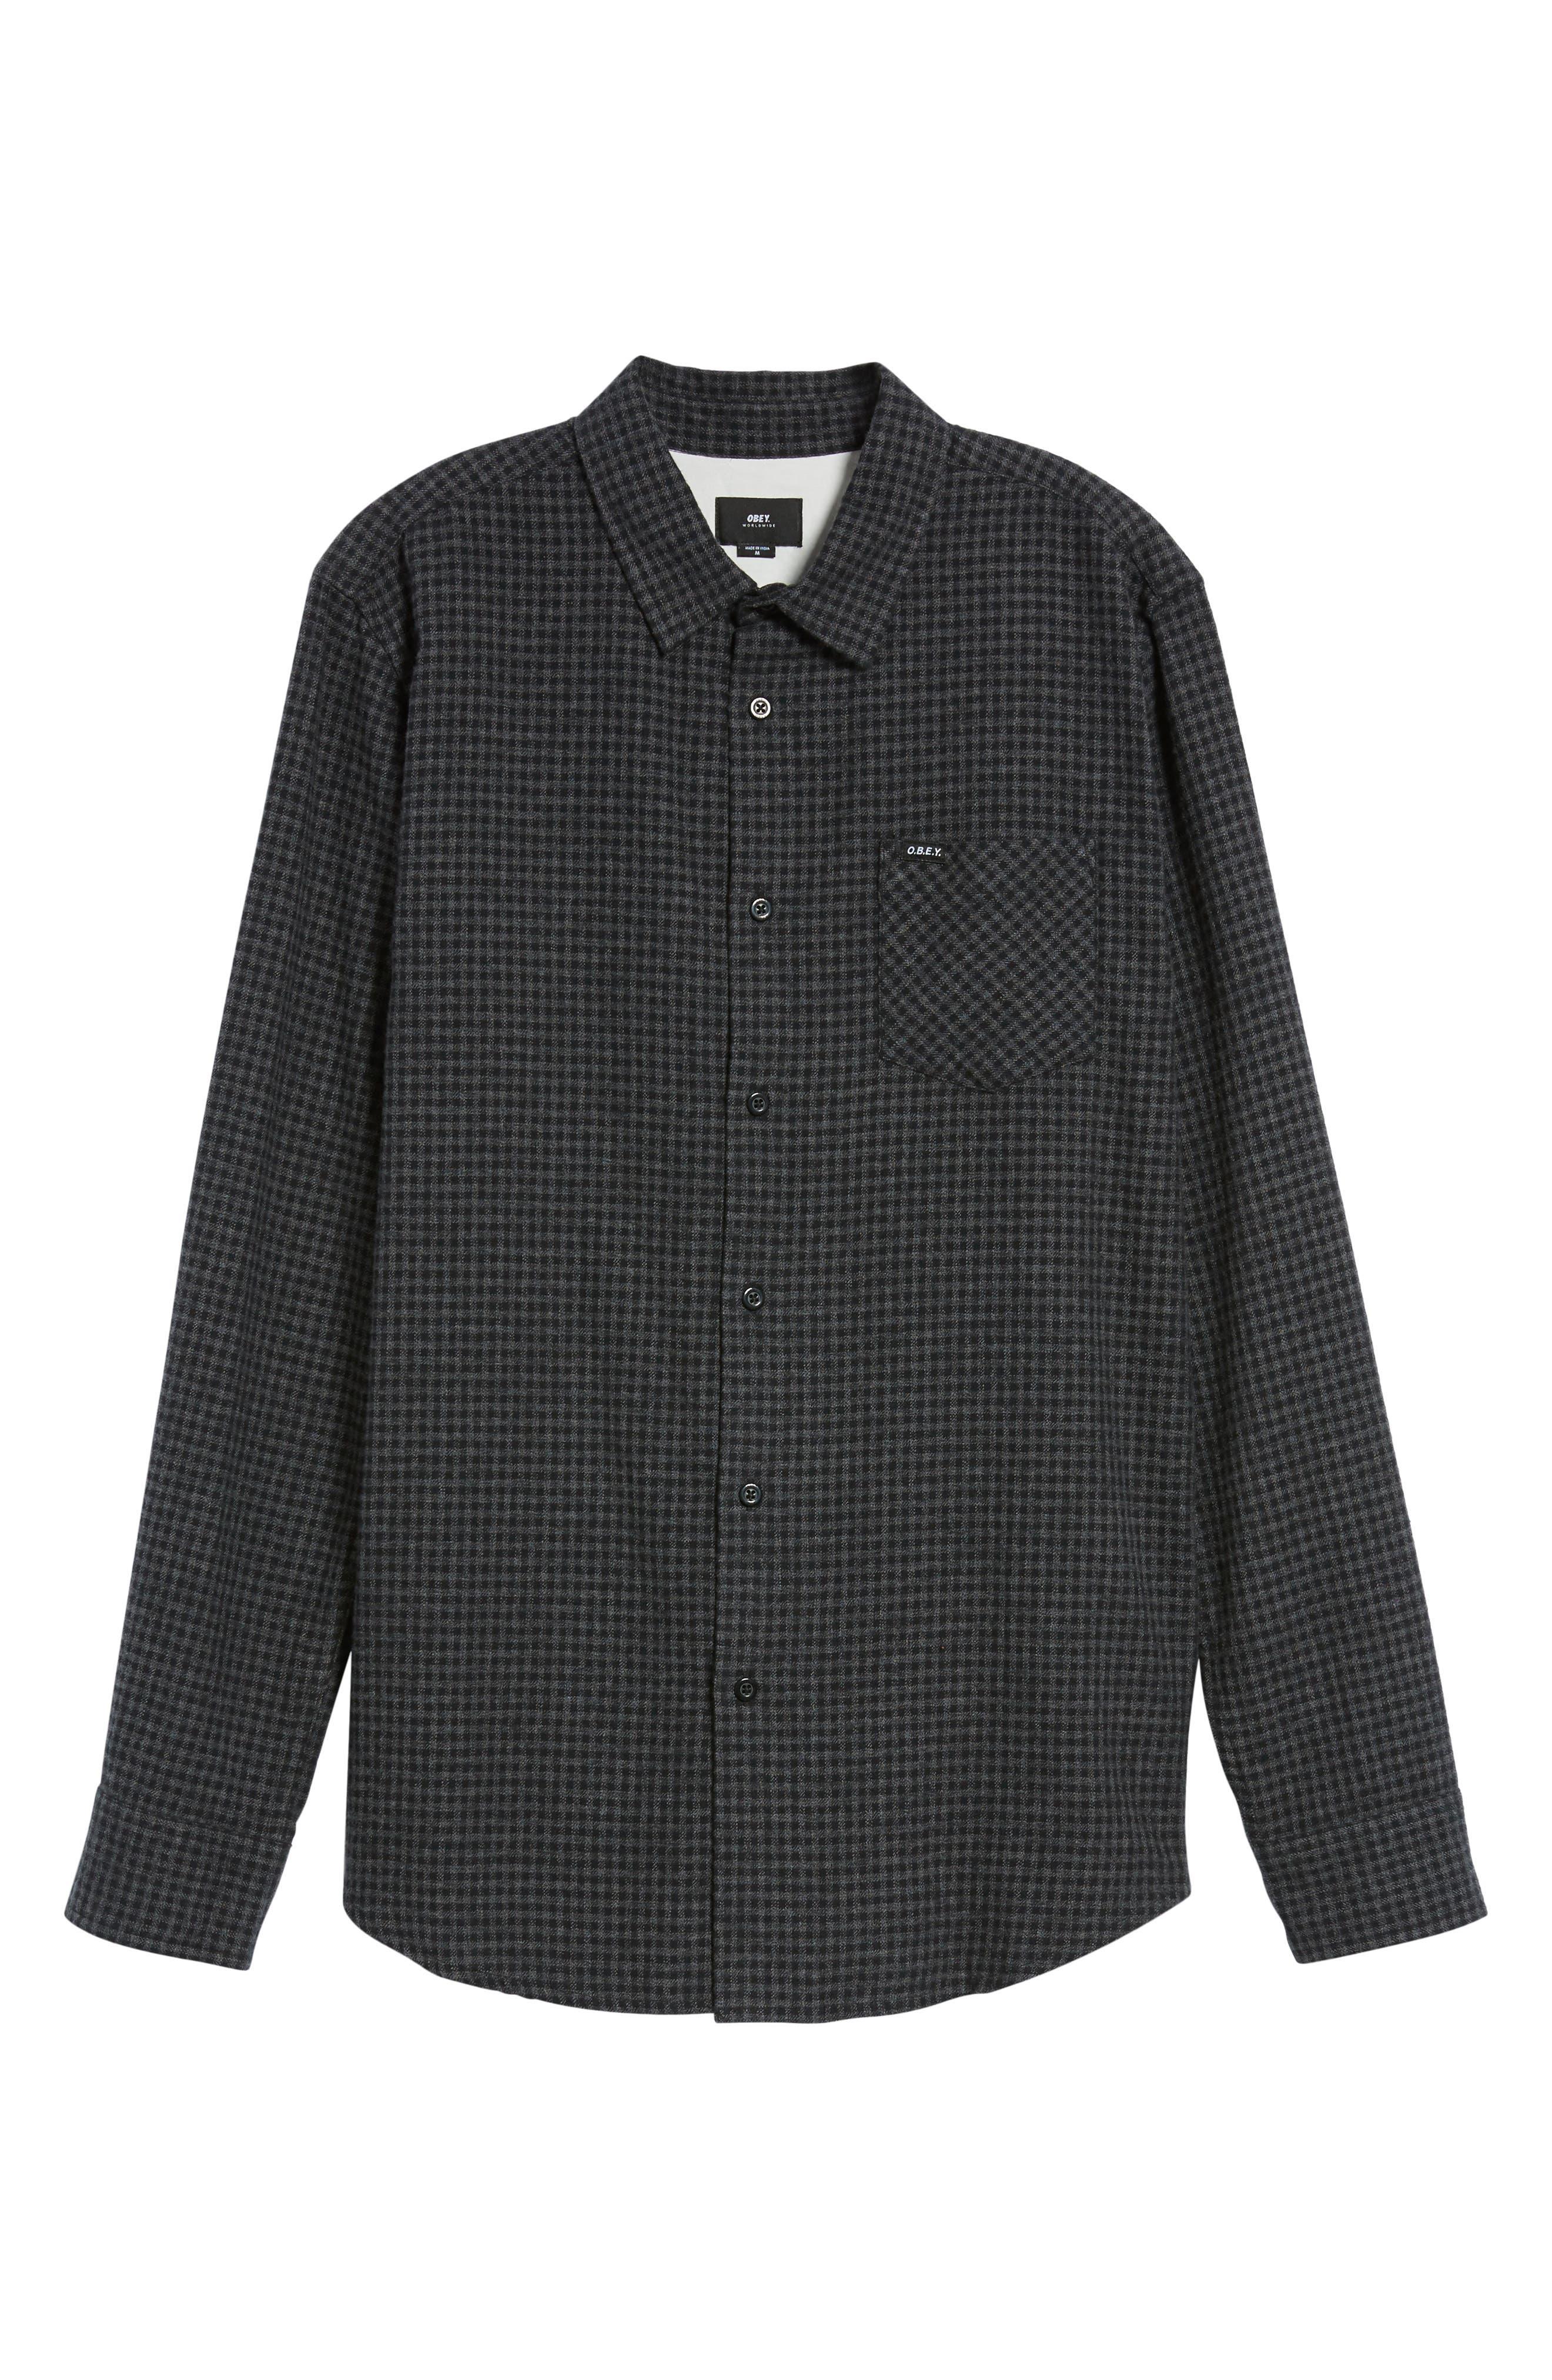 Outsider Microcheck Sport Shirt,                             Alternate thumbnail 6, color,                             Black Multi